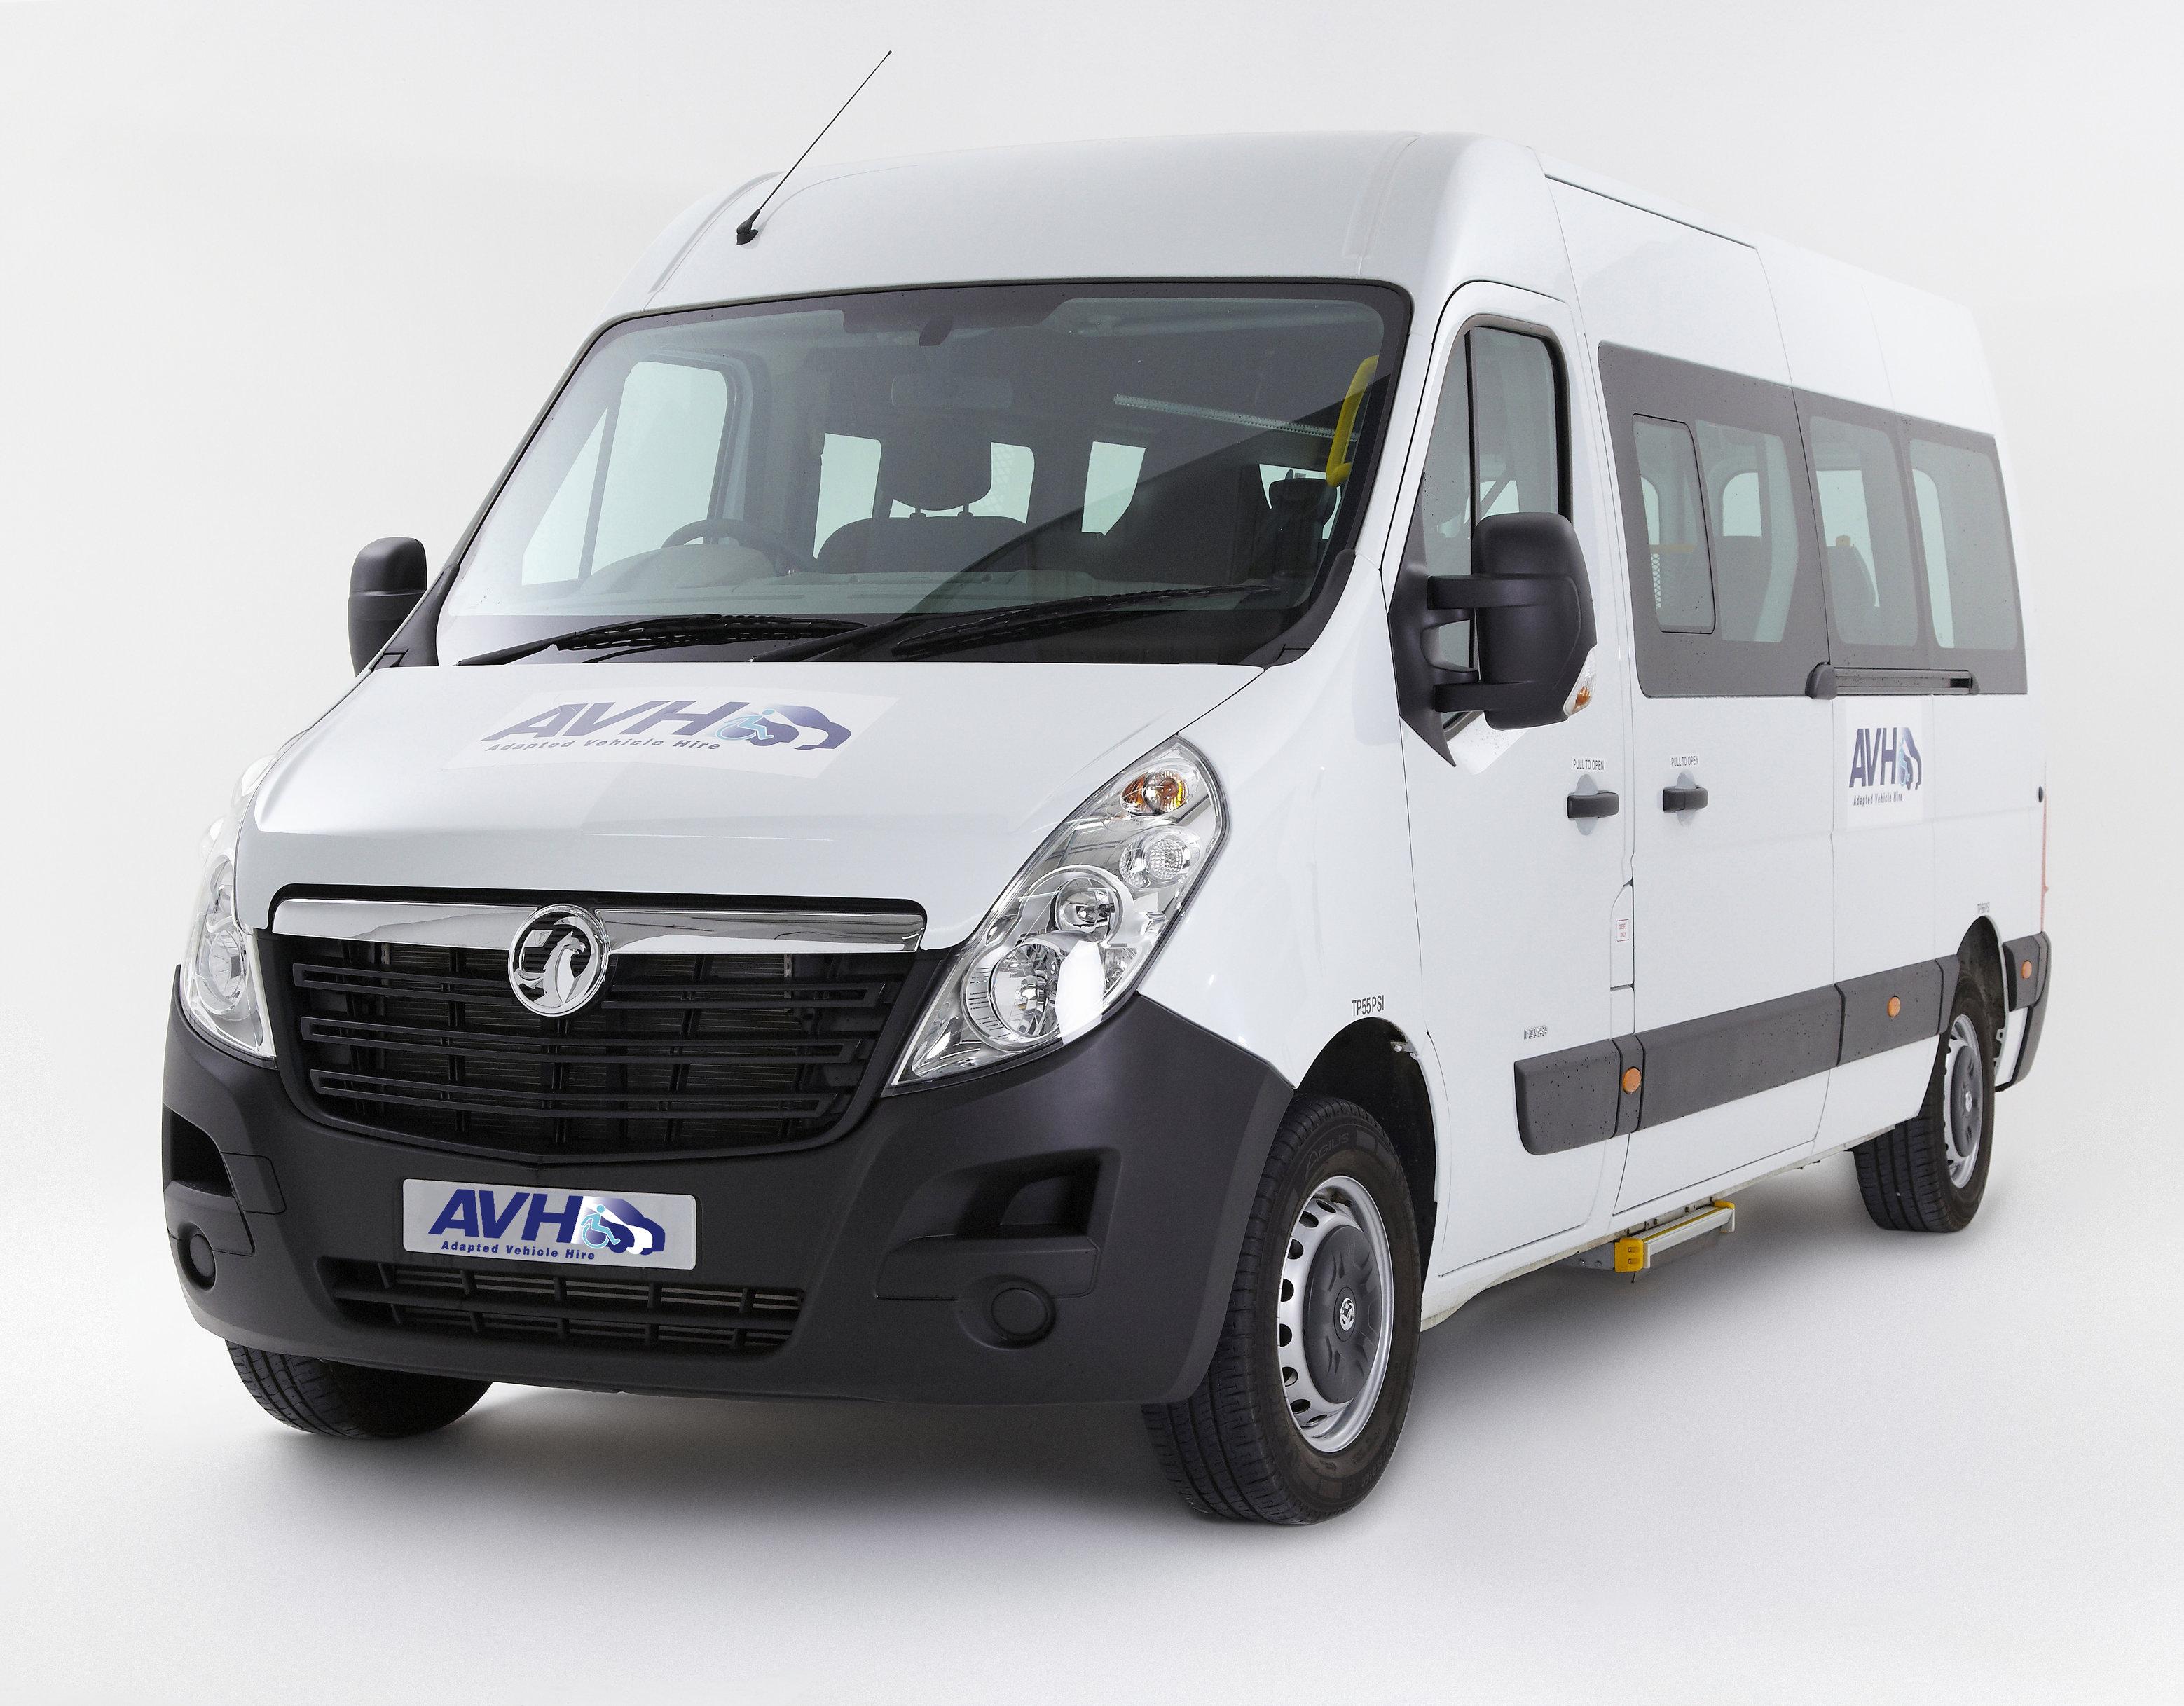 Adapted Vehicles Vehicle Ideas